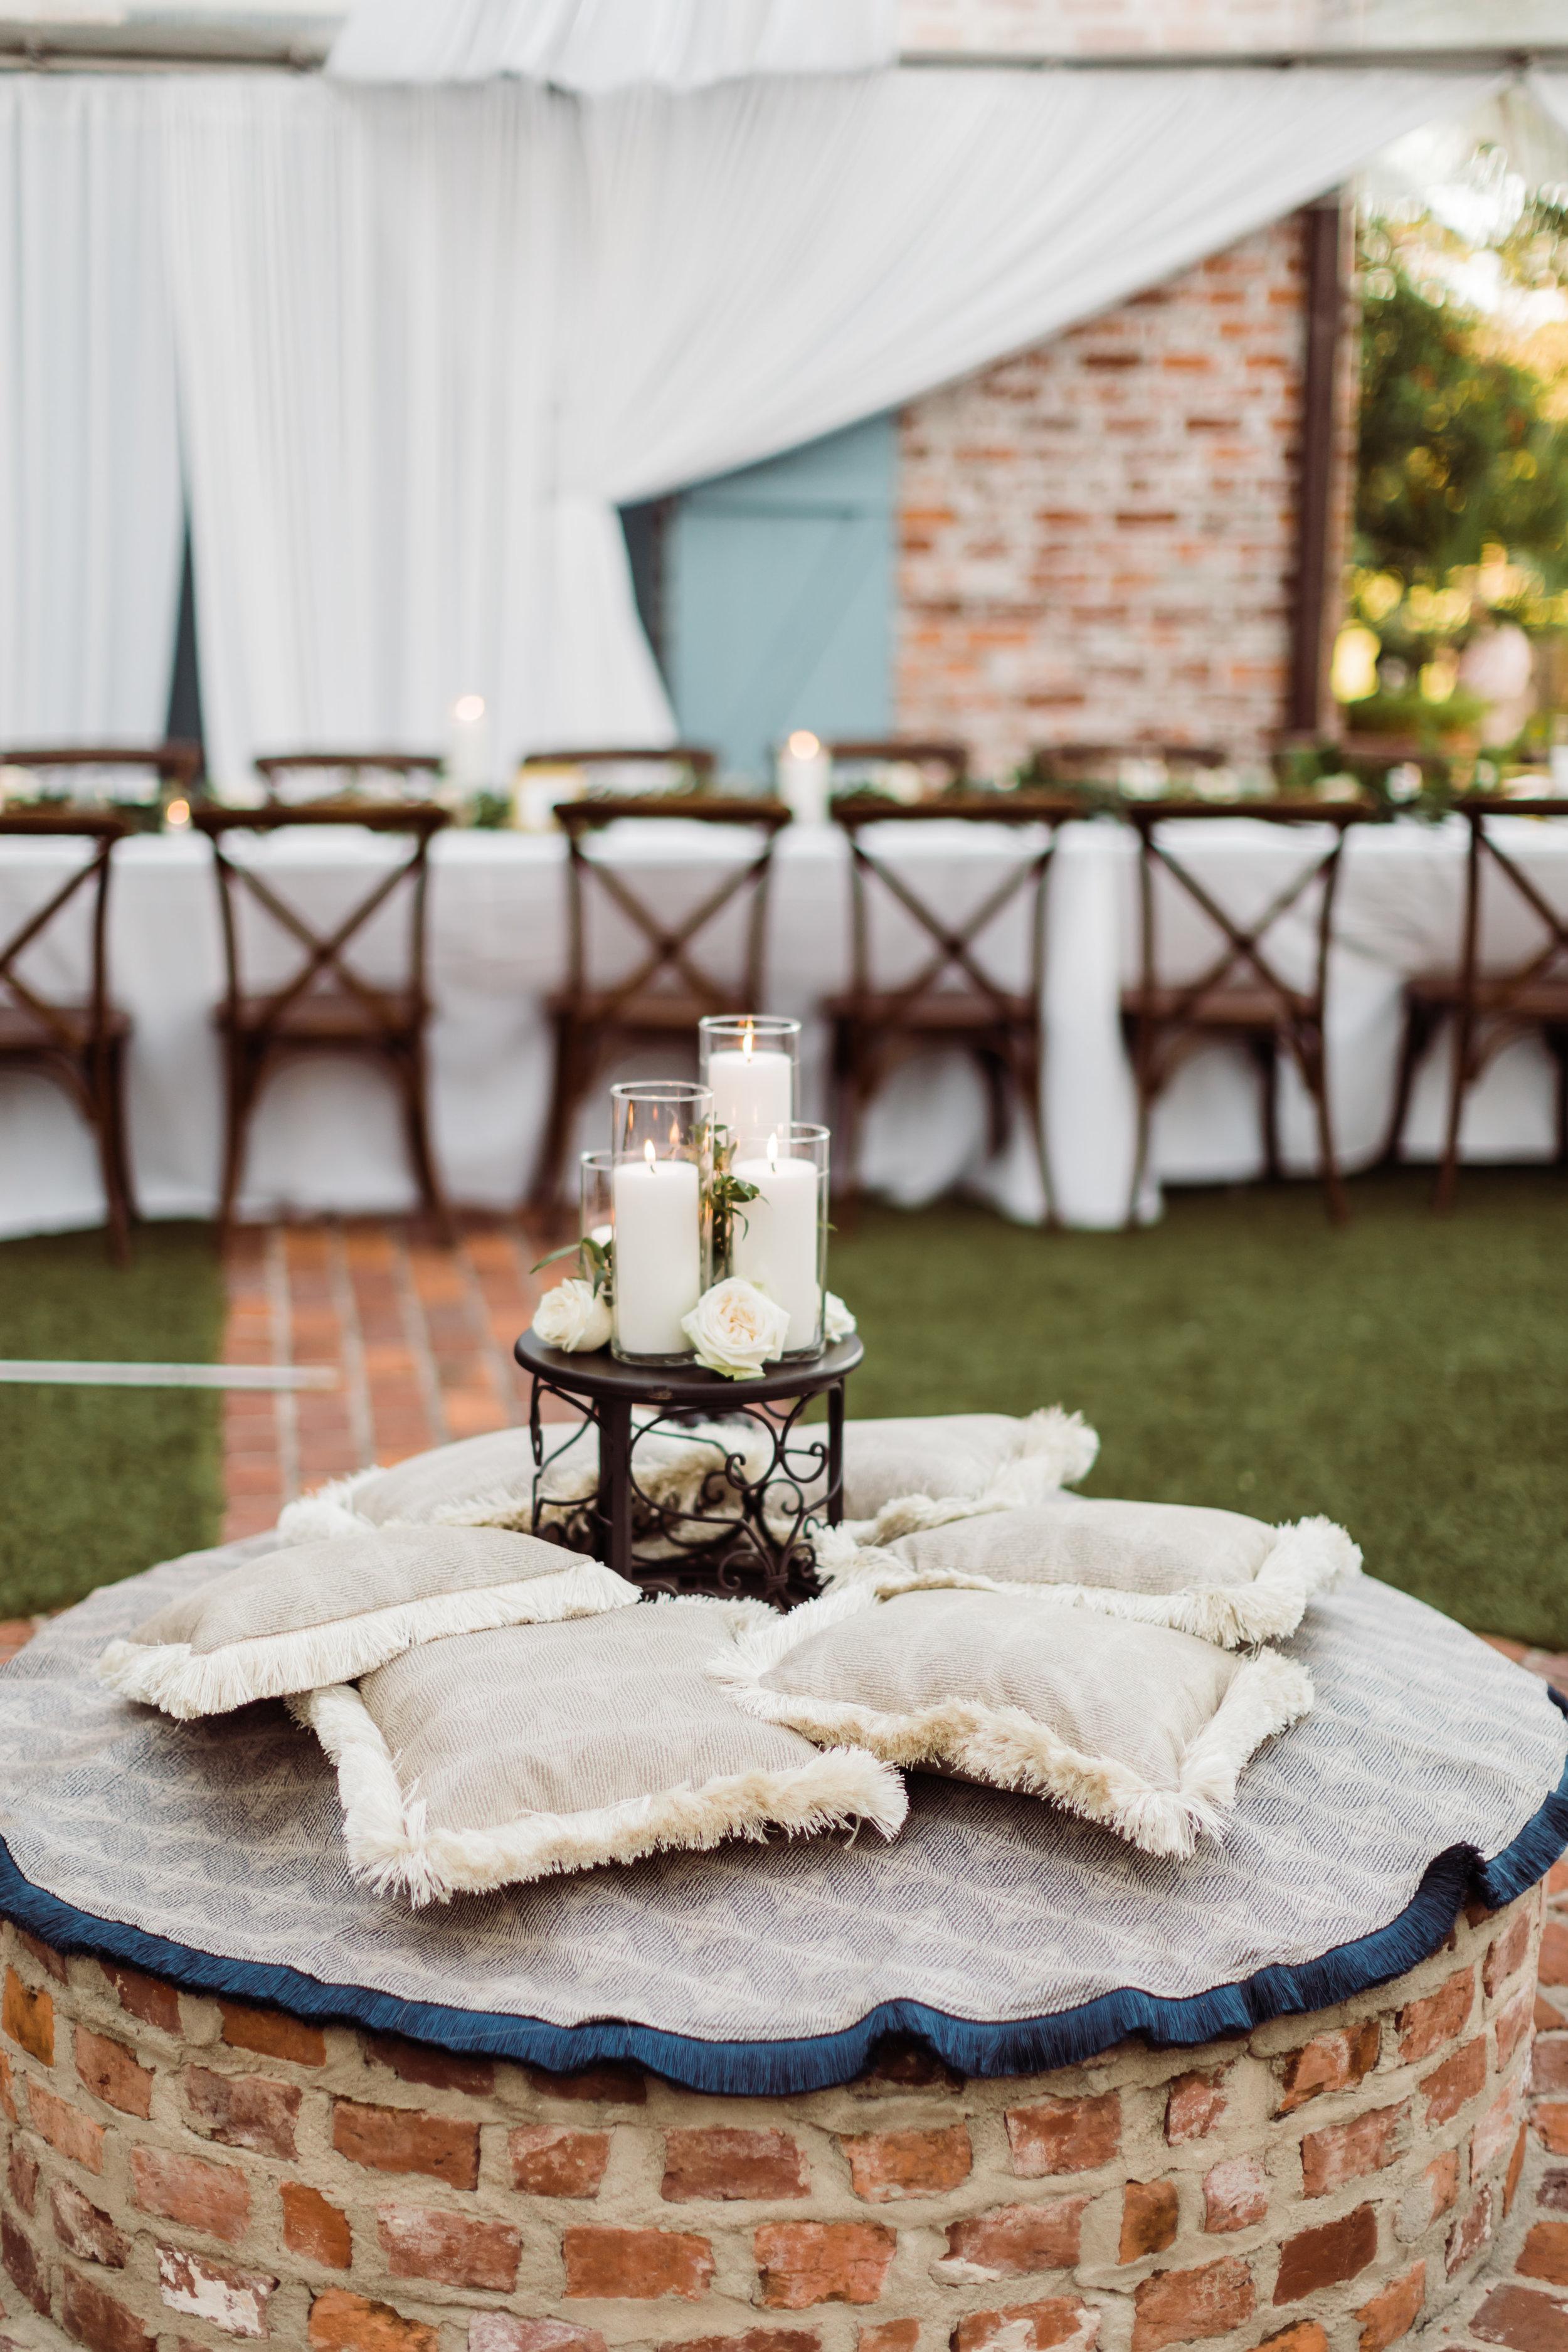 2017.10.15 Steffi and Elliott Simmonds Casa Feliz Wedding (634 of 969).jpg